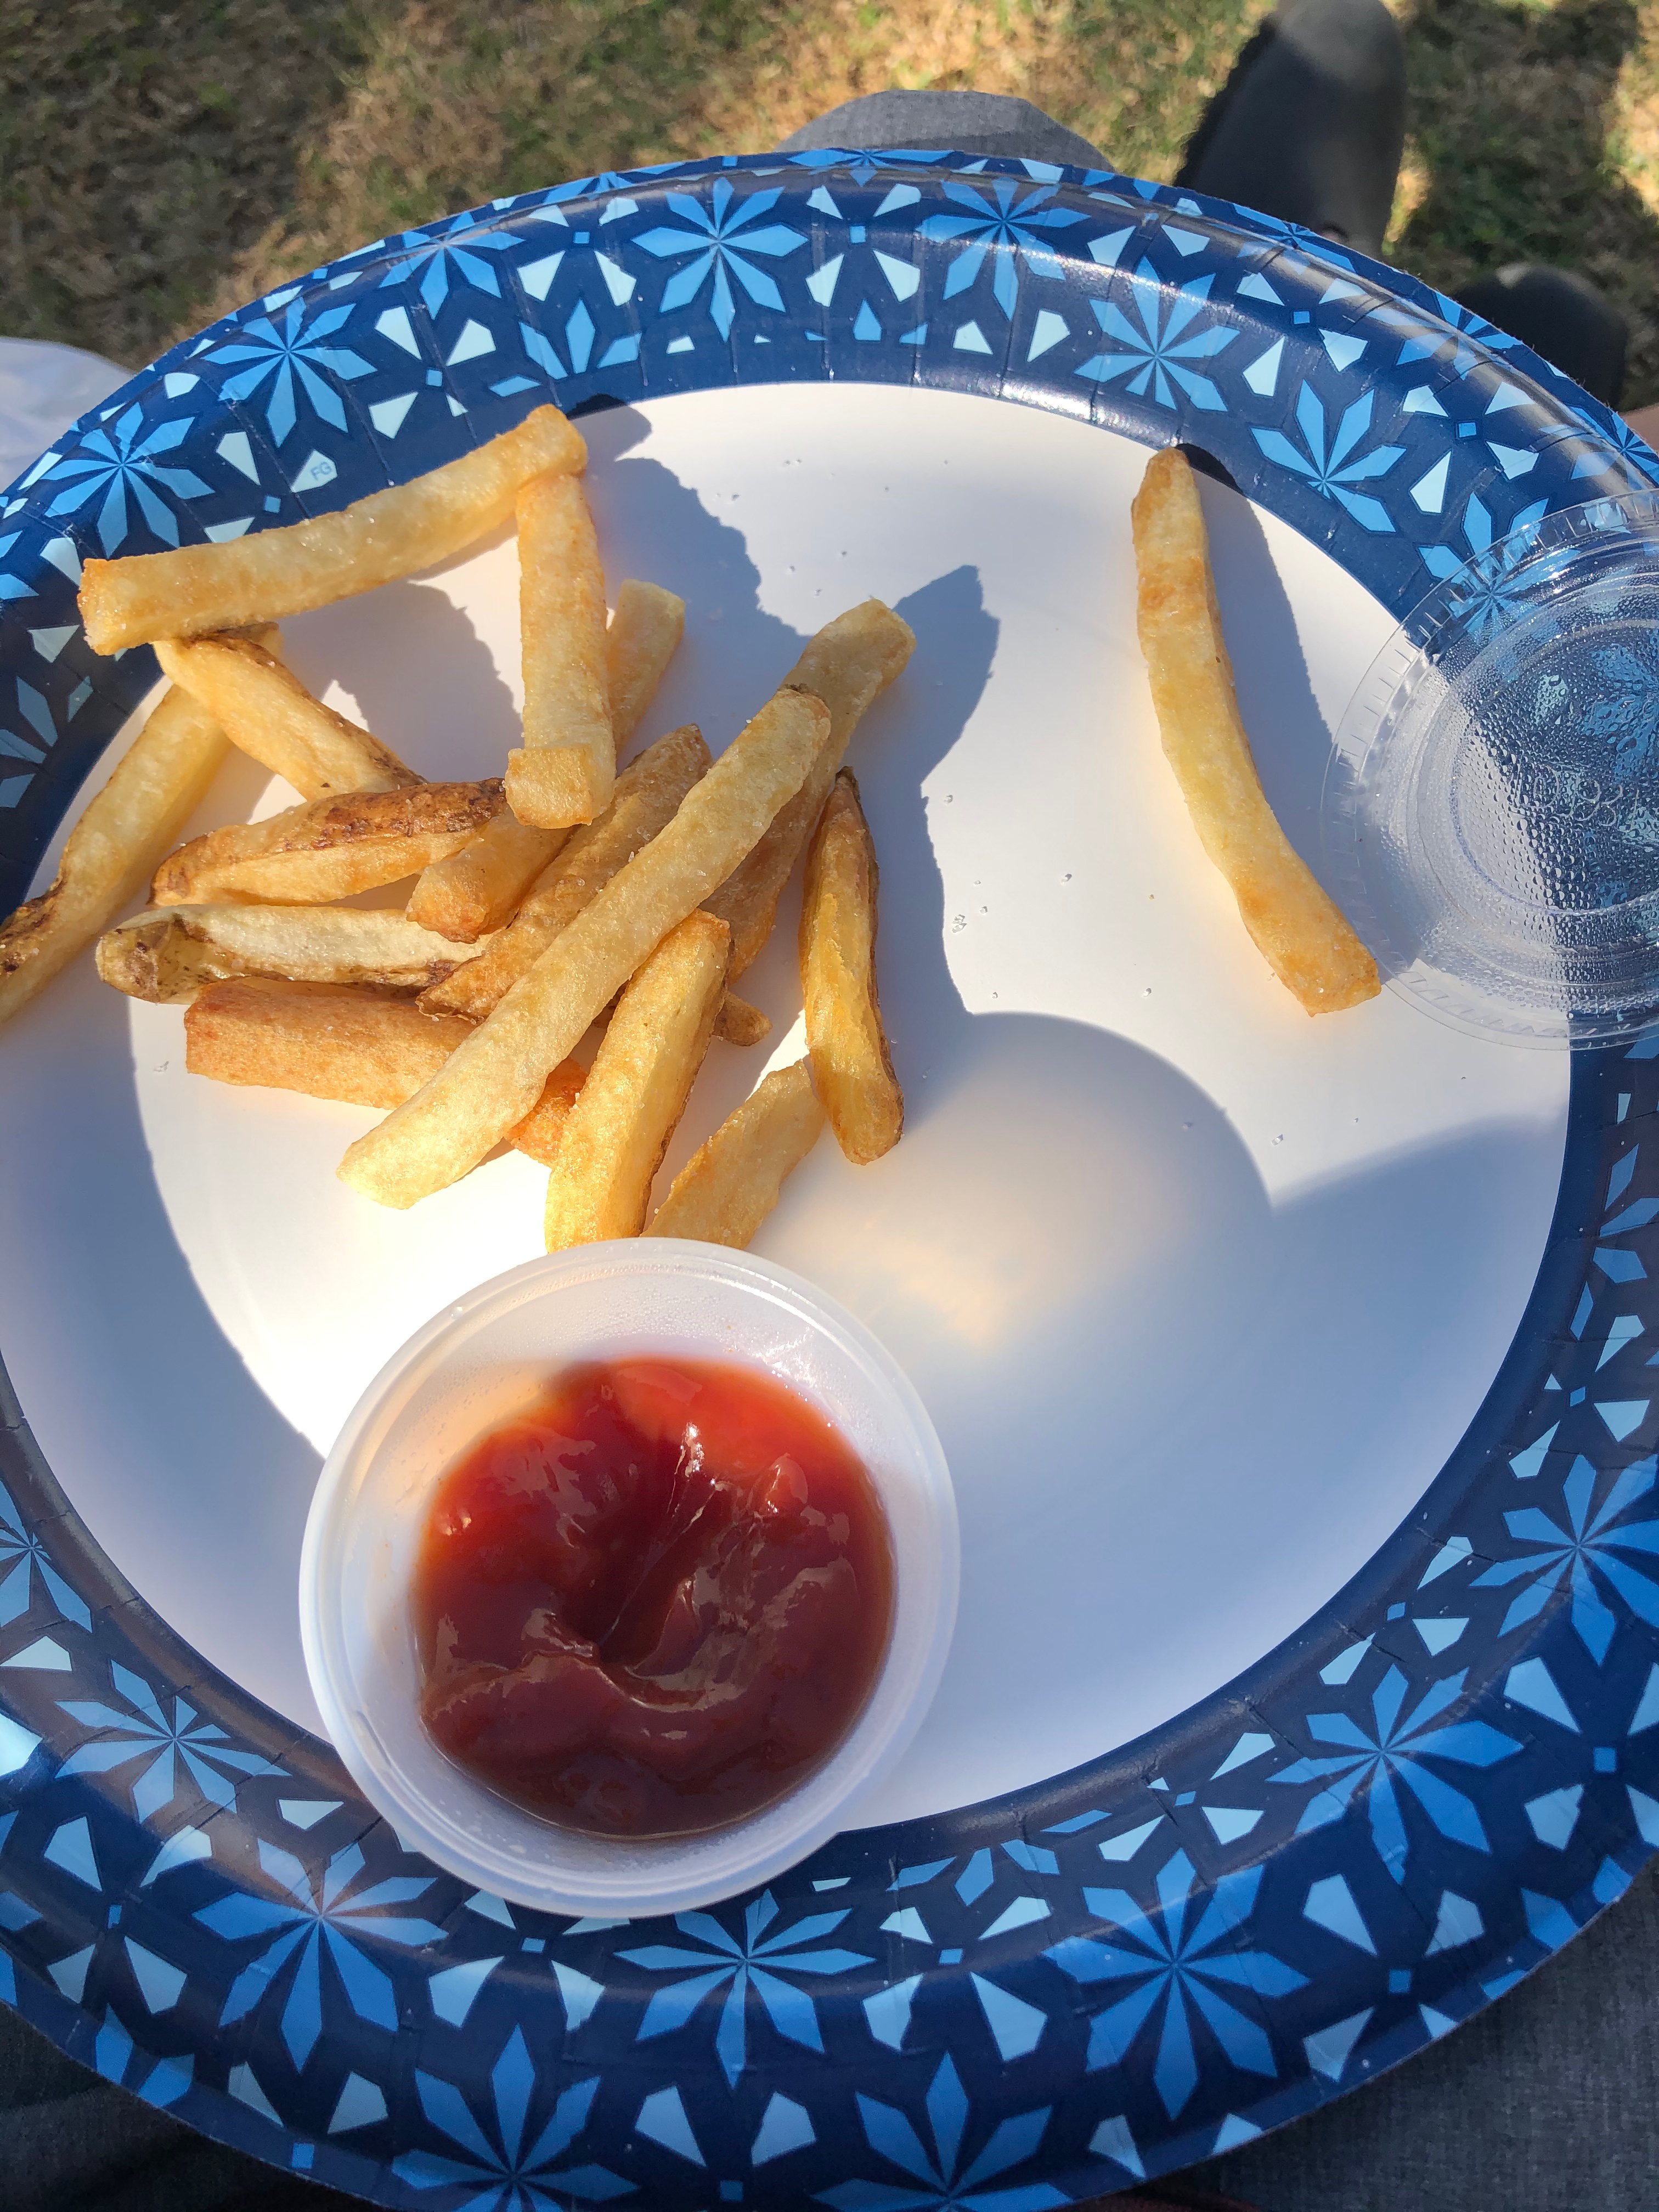 Fries, duh